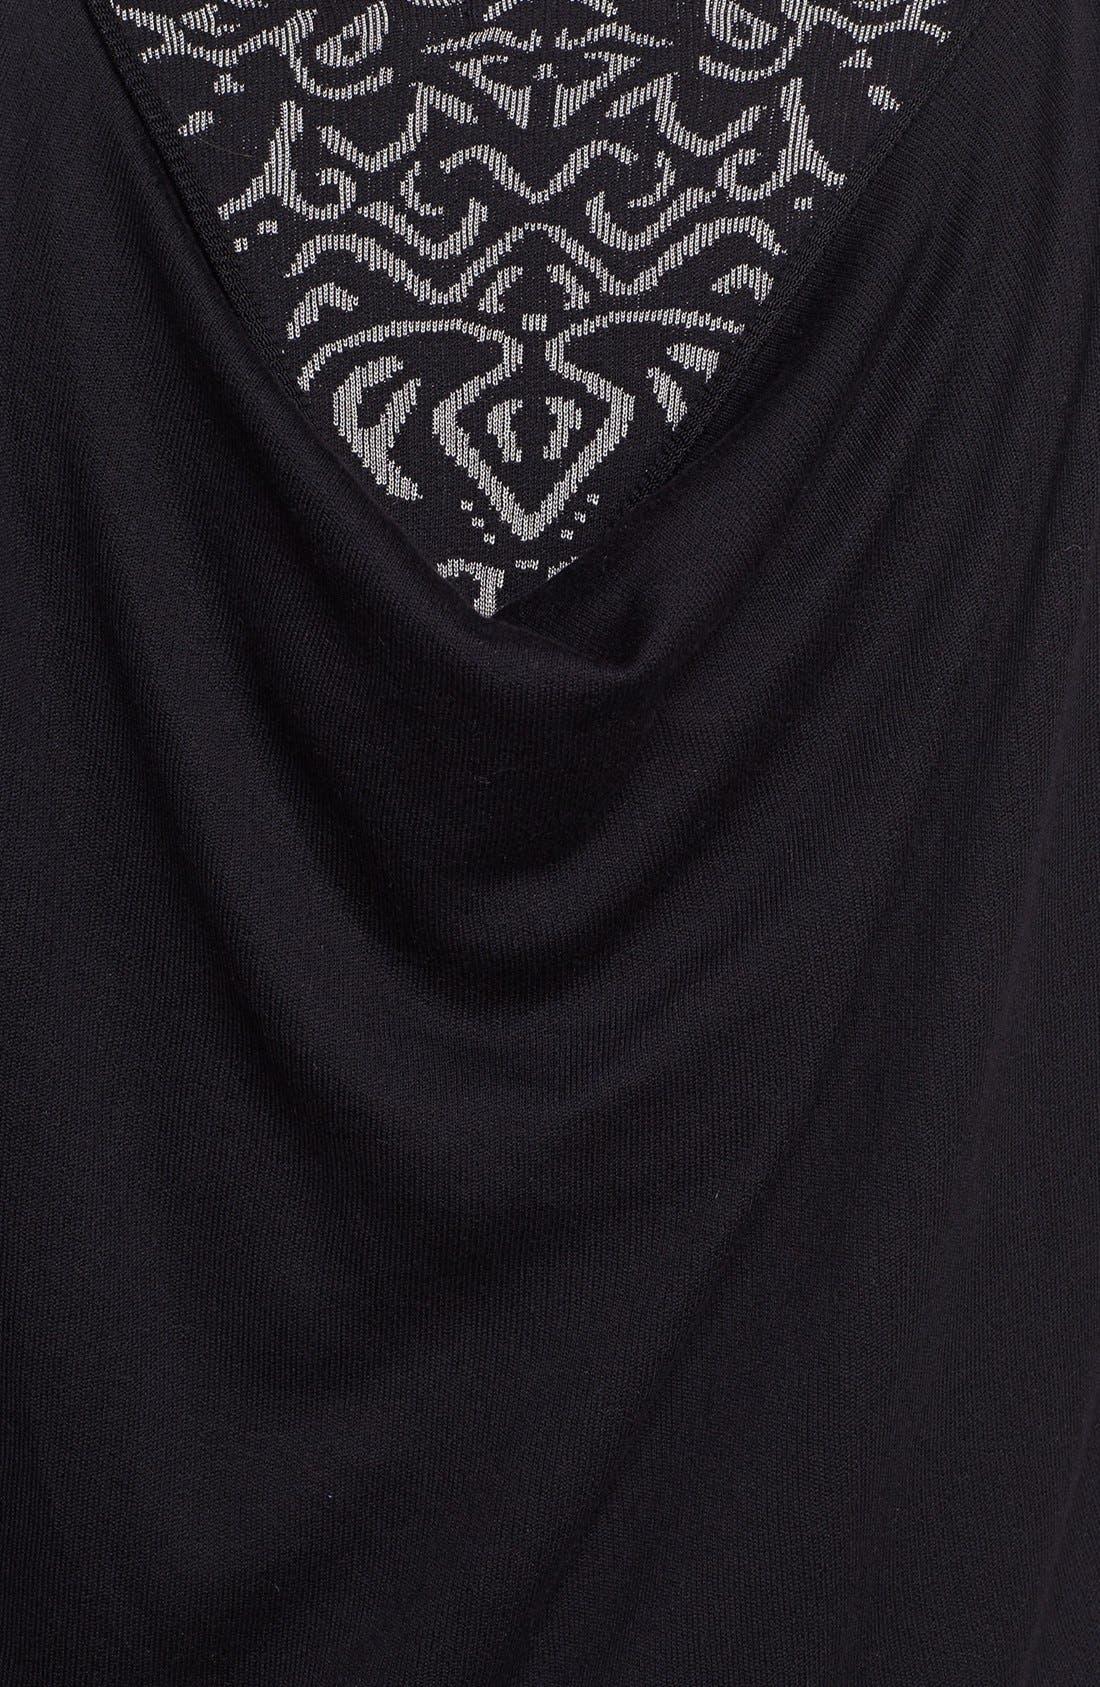 Alternate Image 3  - NIC+ZOE Back Drape Sweater (Plus Size)